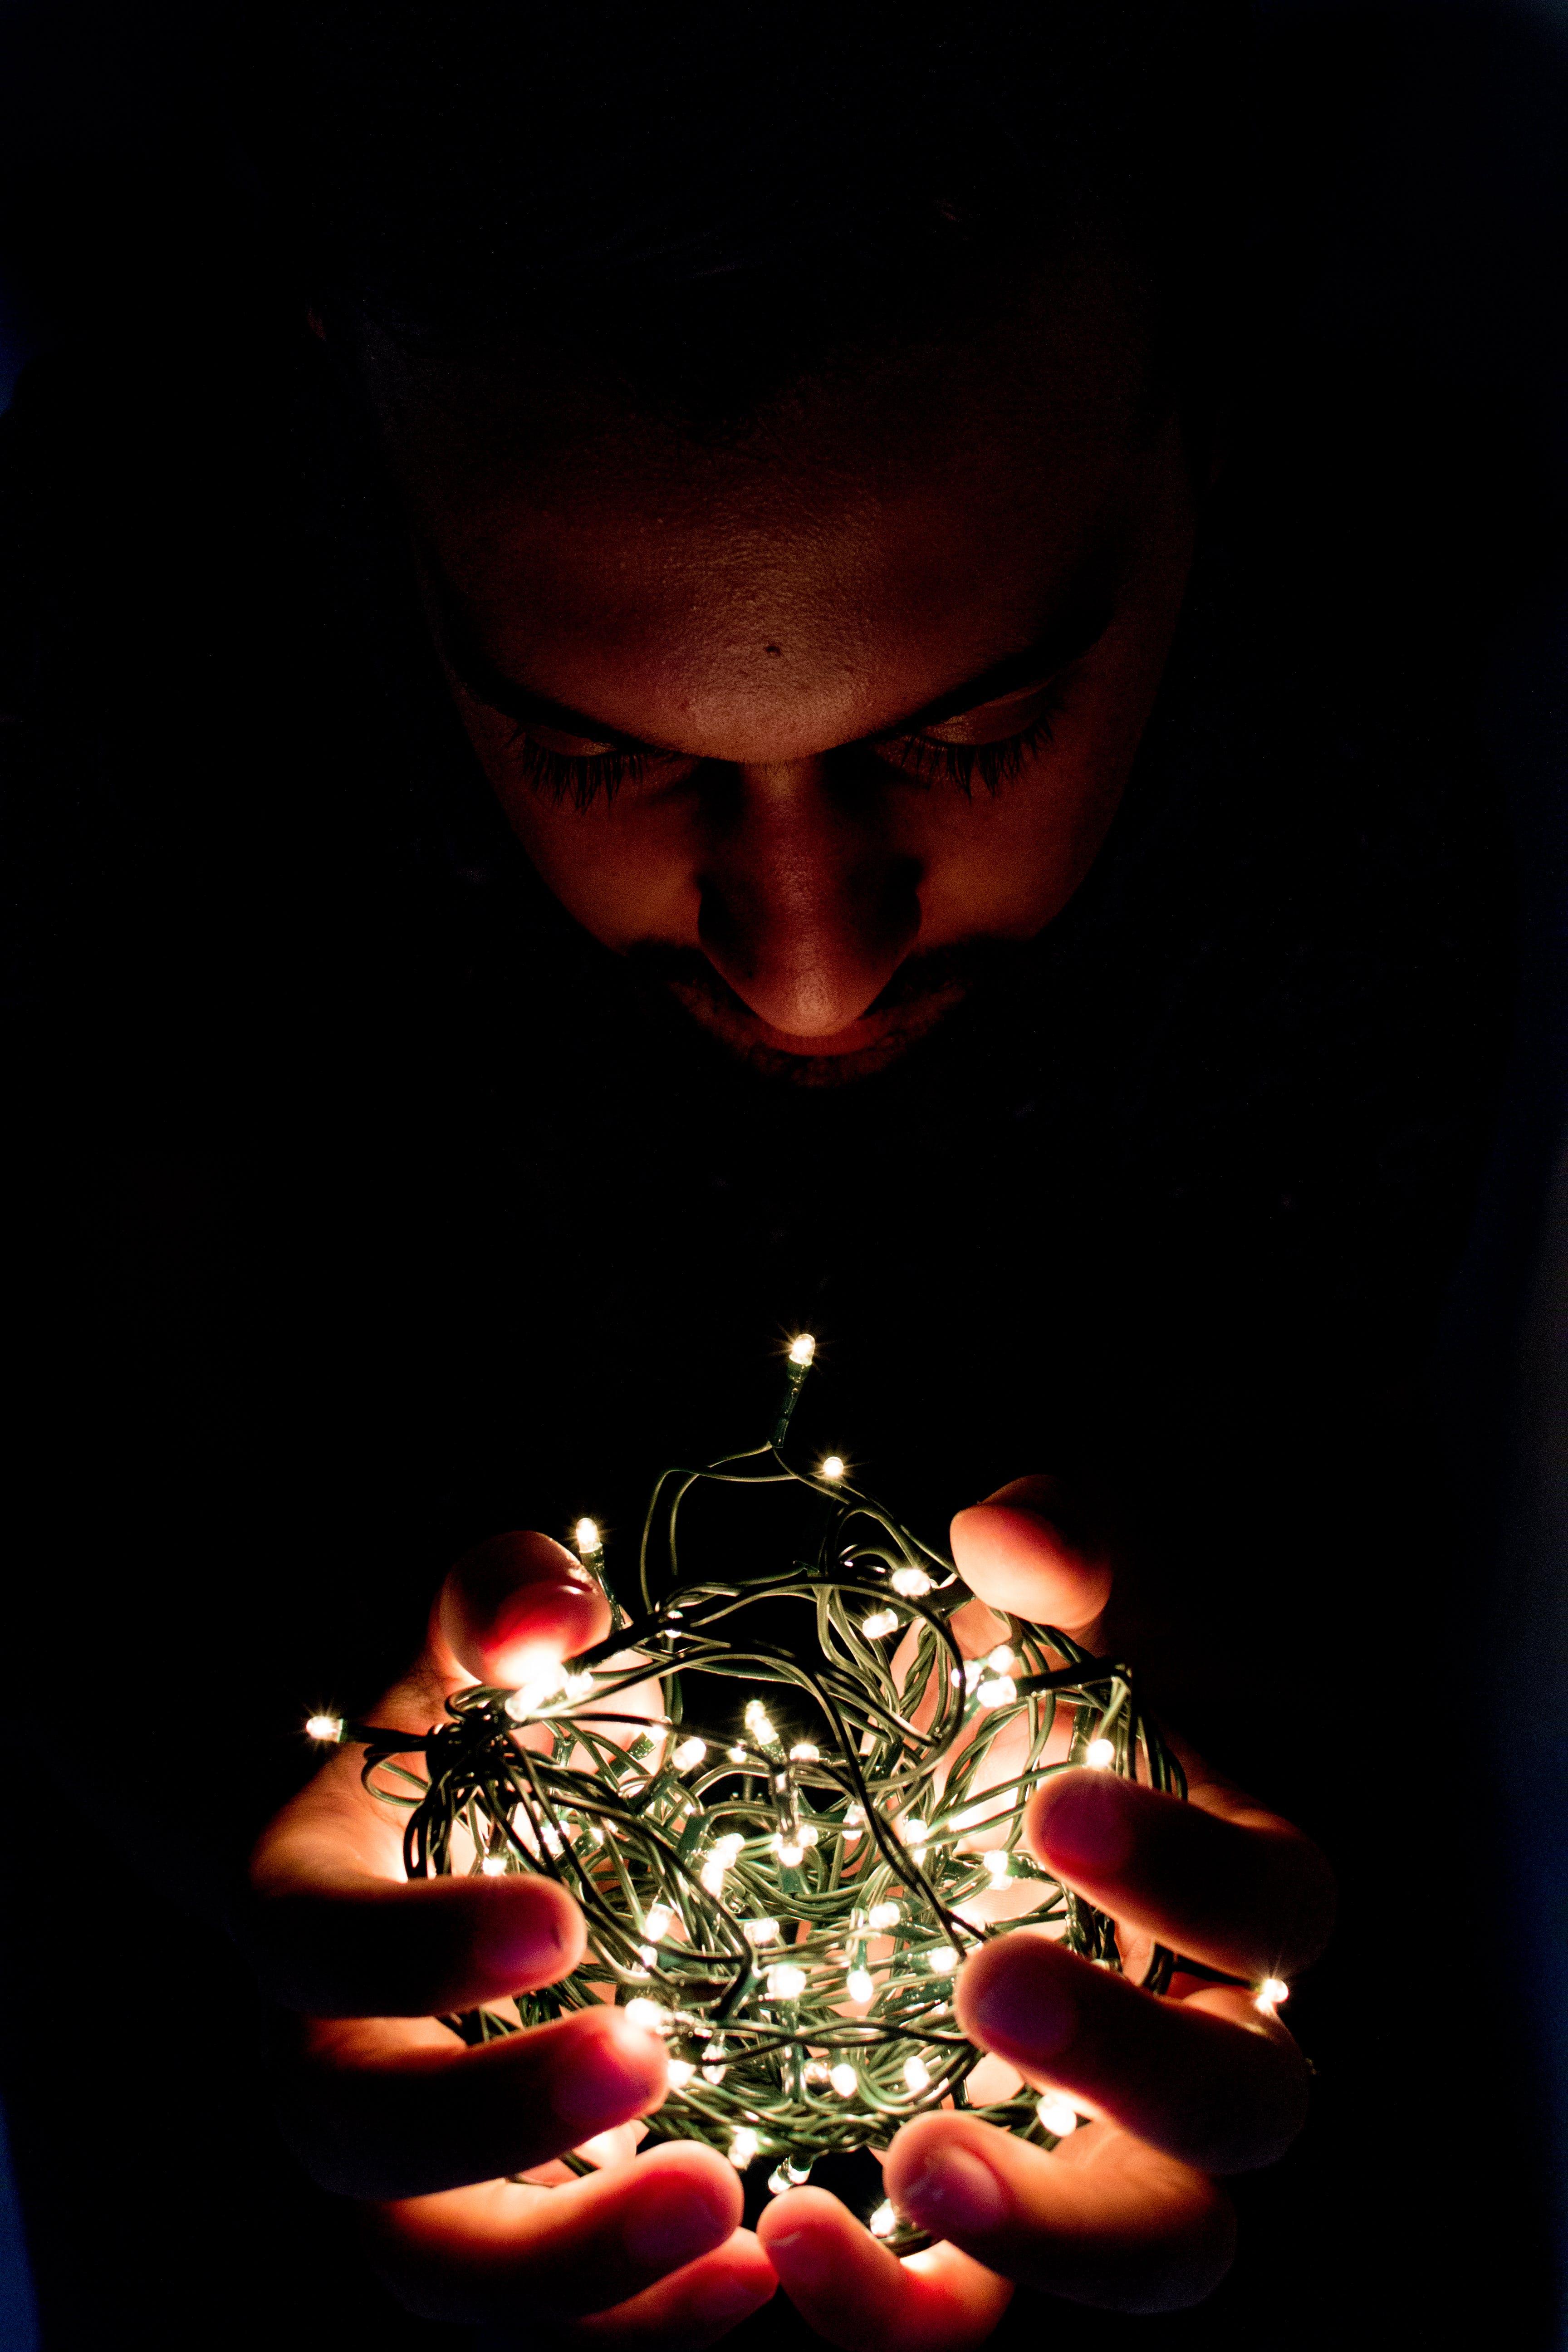 Man Holding String Light